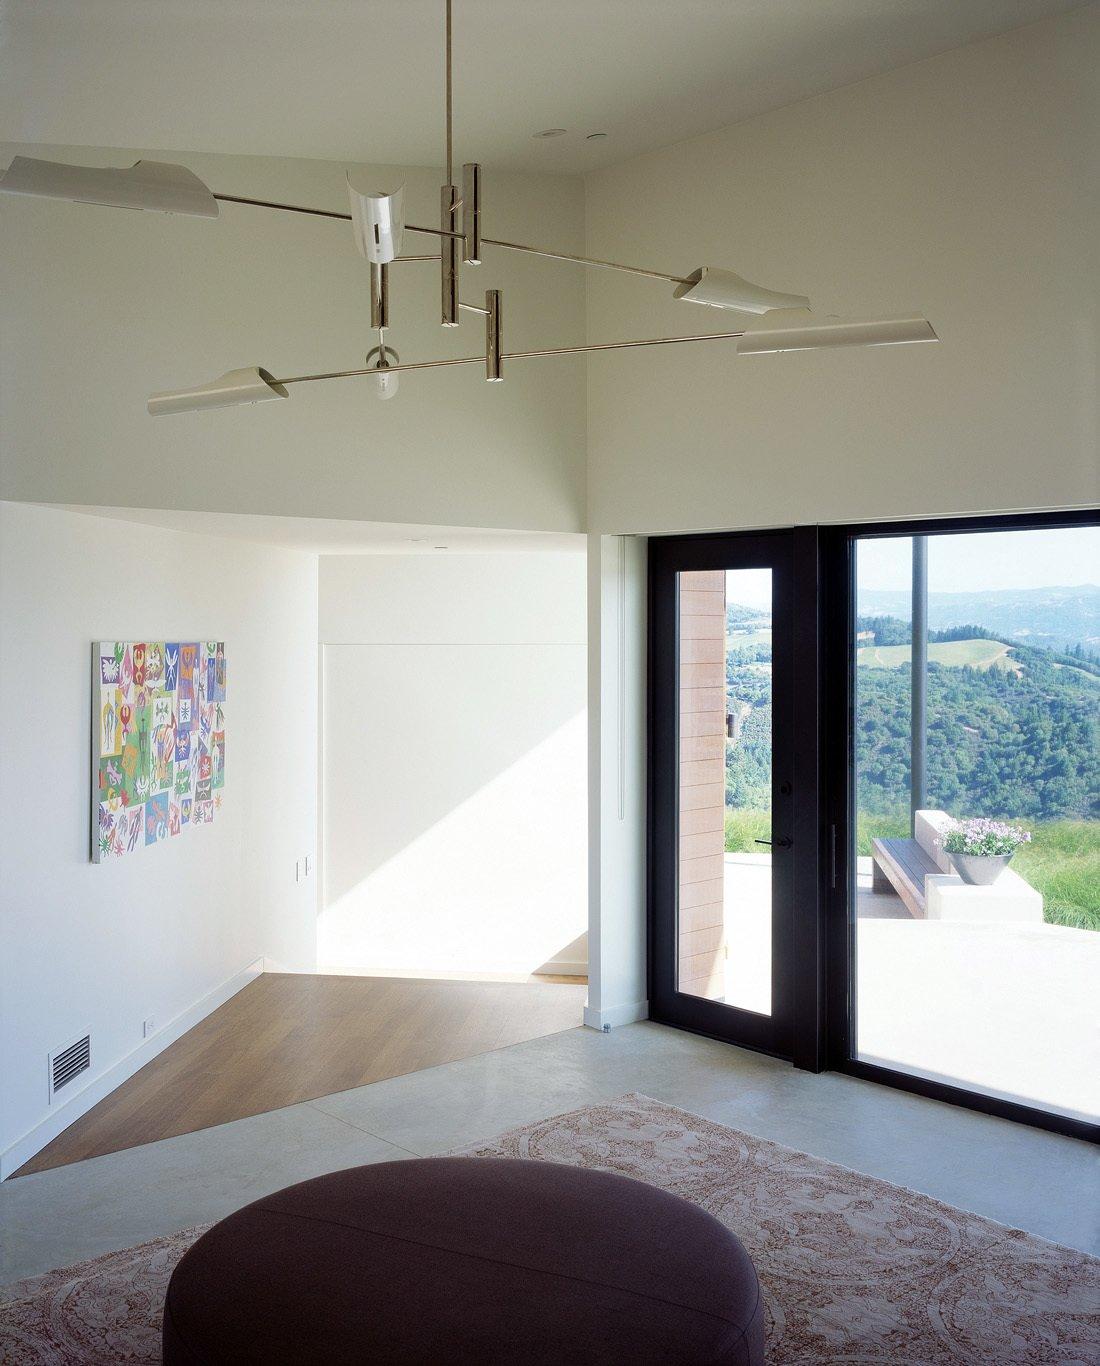 Ridge House Tagged: Hallway, Concrete Floor, and Medium Hardwood Floor.  Ridge House by Cary Bernstein Architect